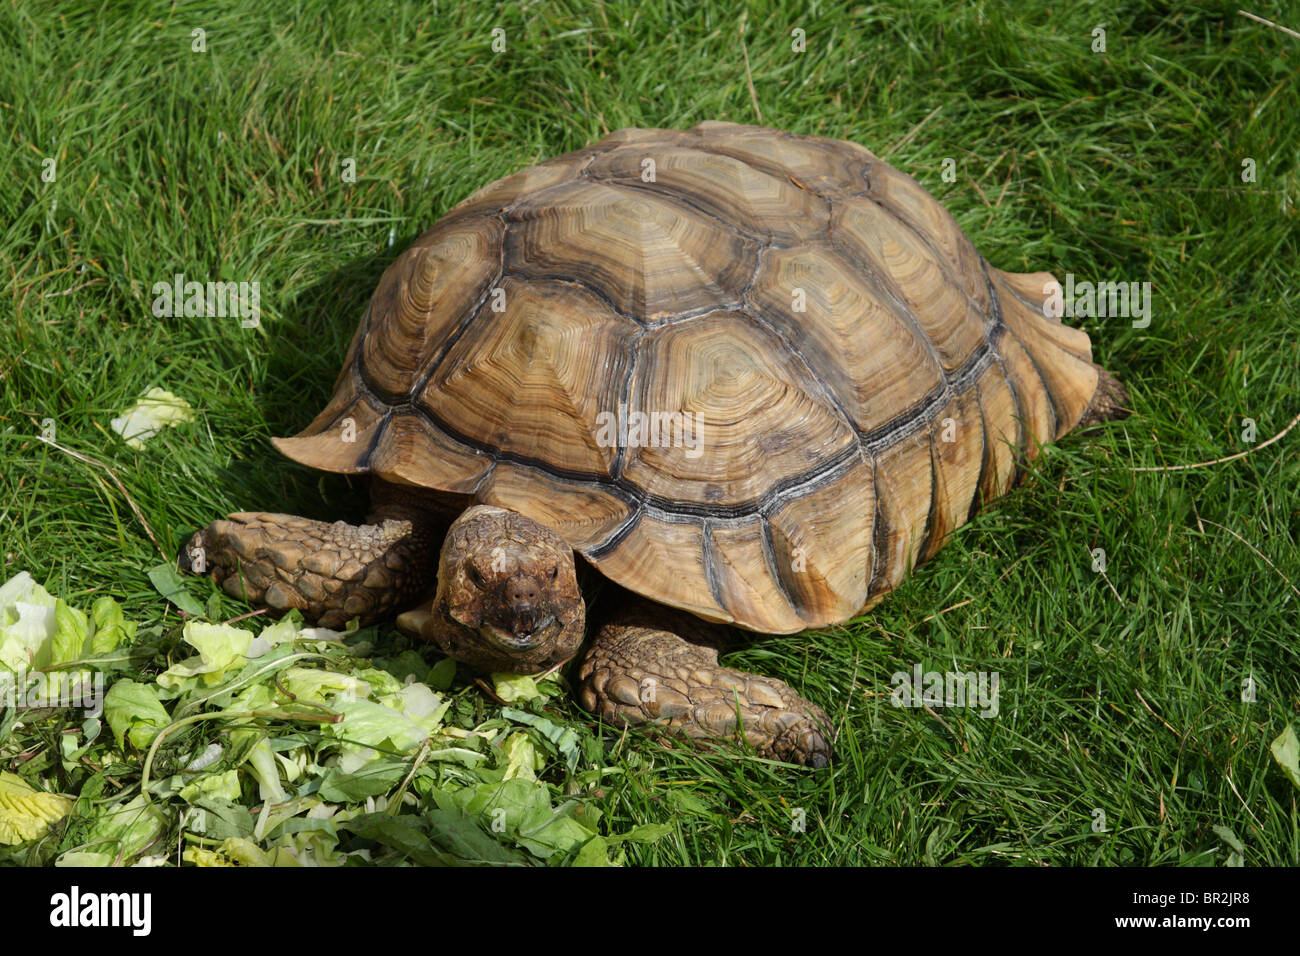 Garden Tortoise Stock Photos & Garden Tortoise Stock Images - Alamy